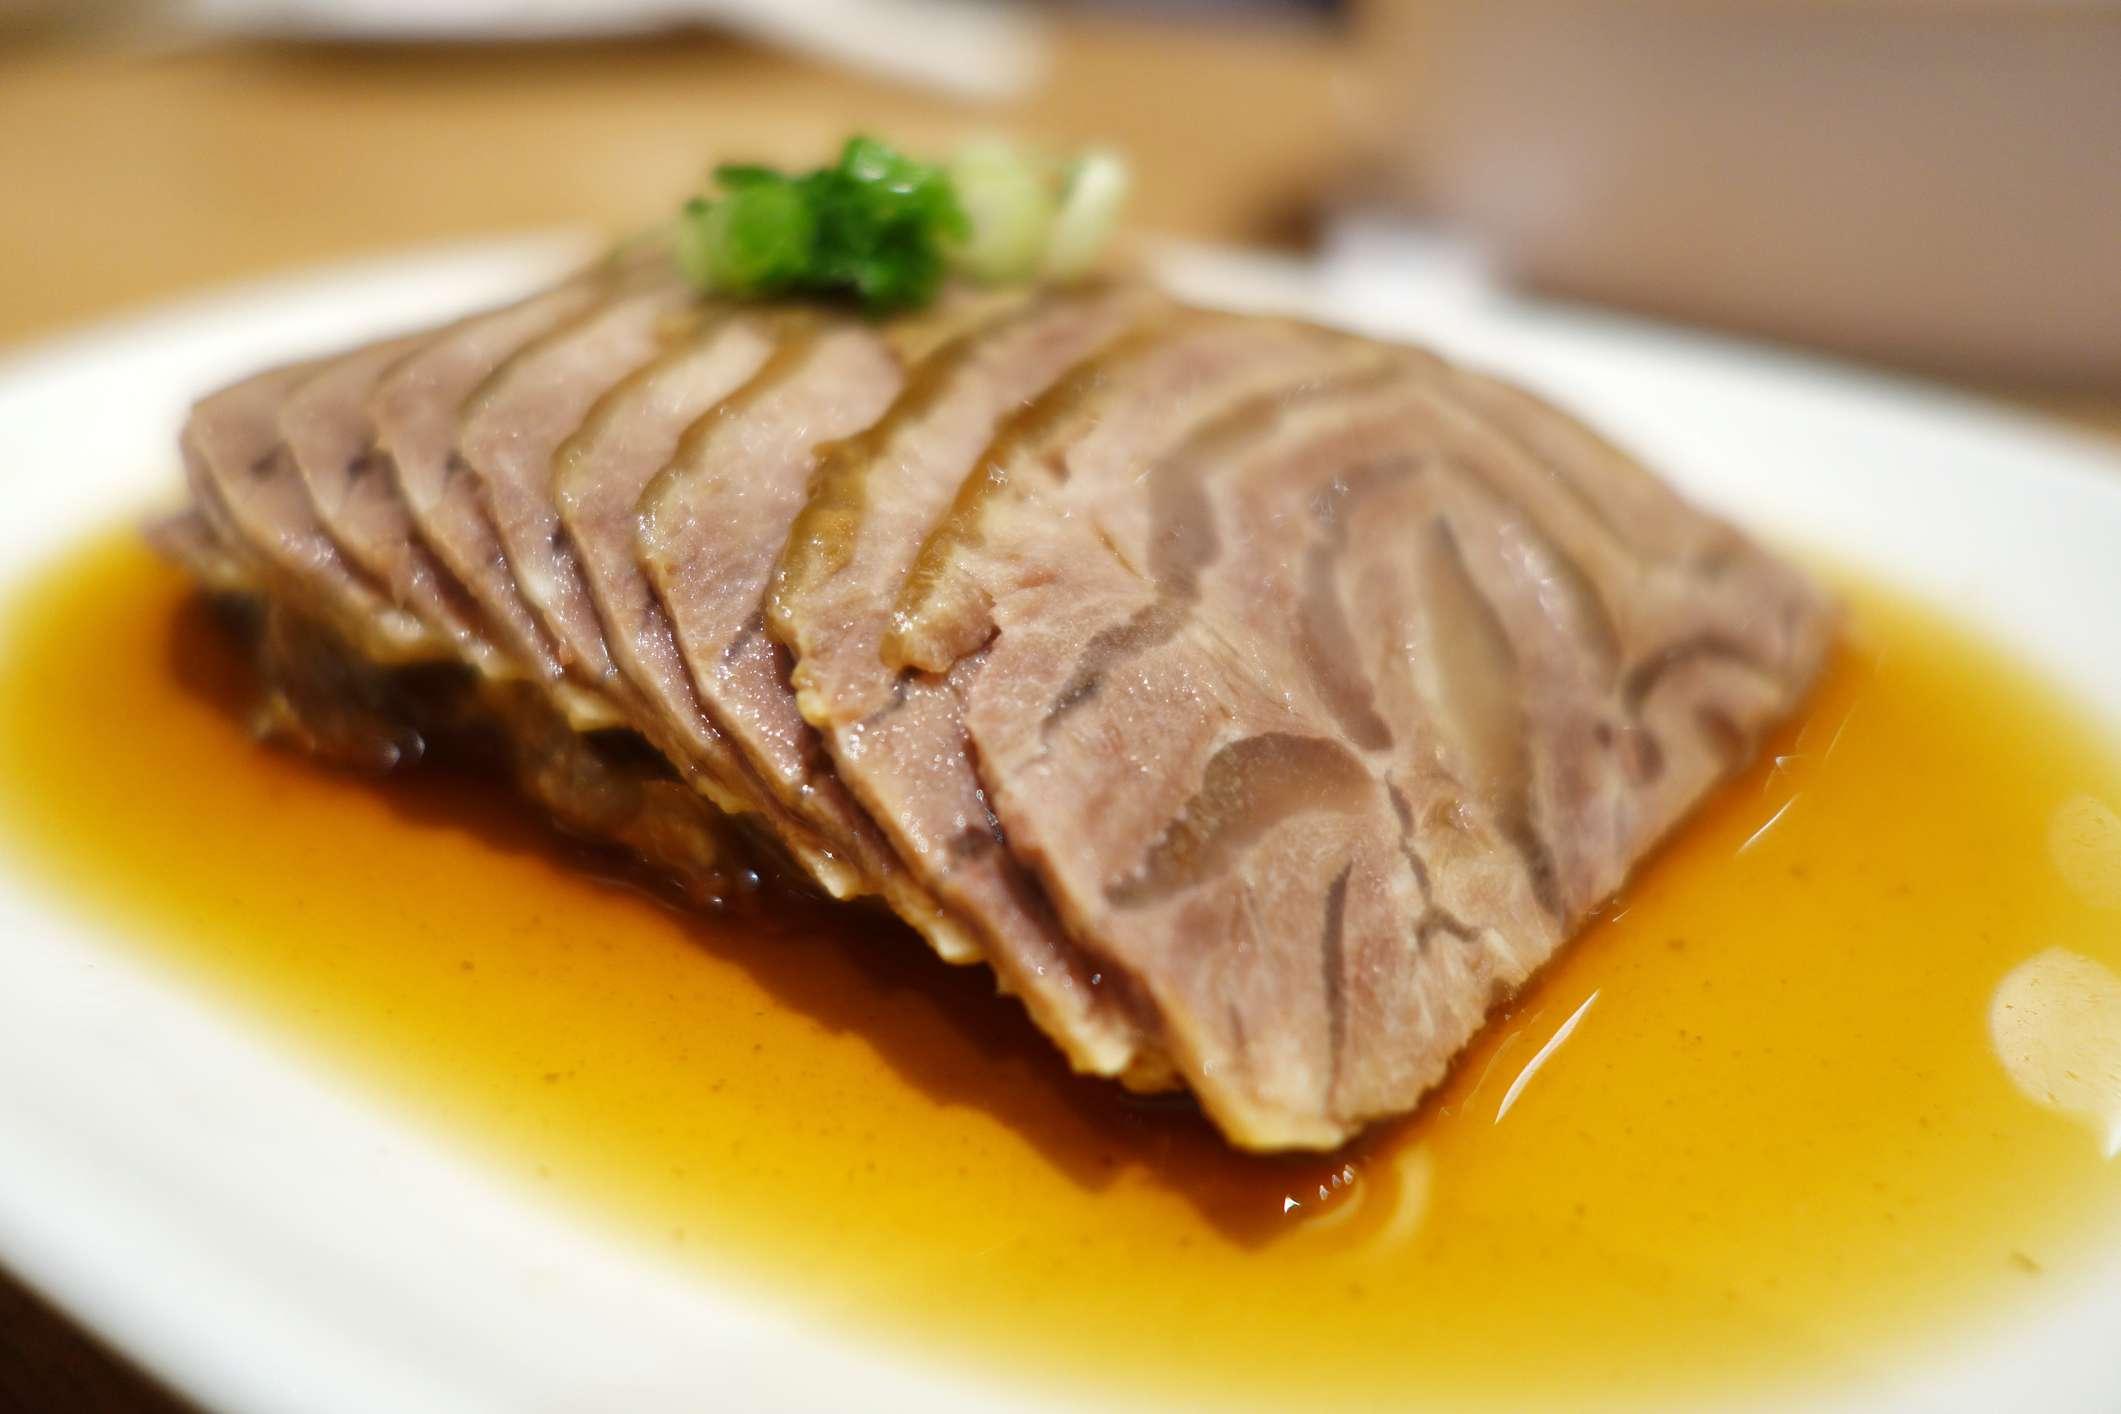 Pork aspic on a plate